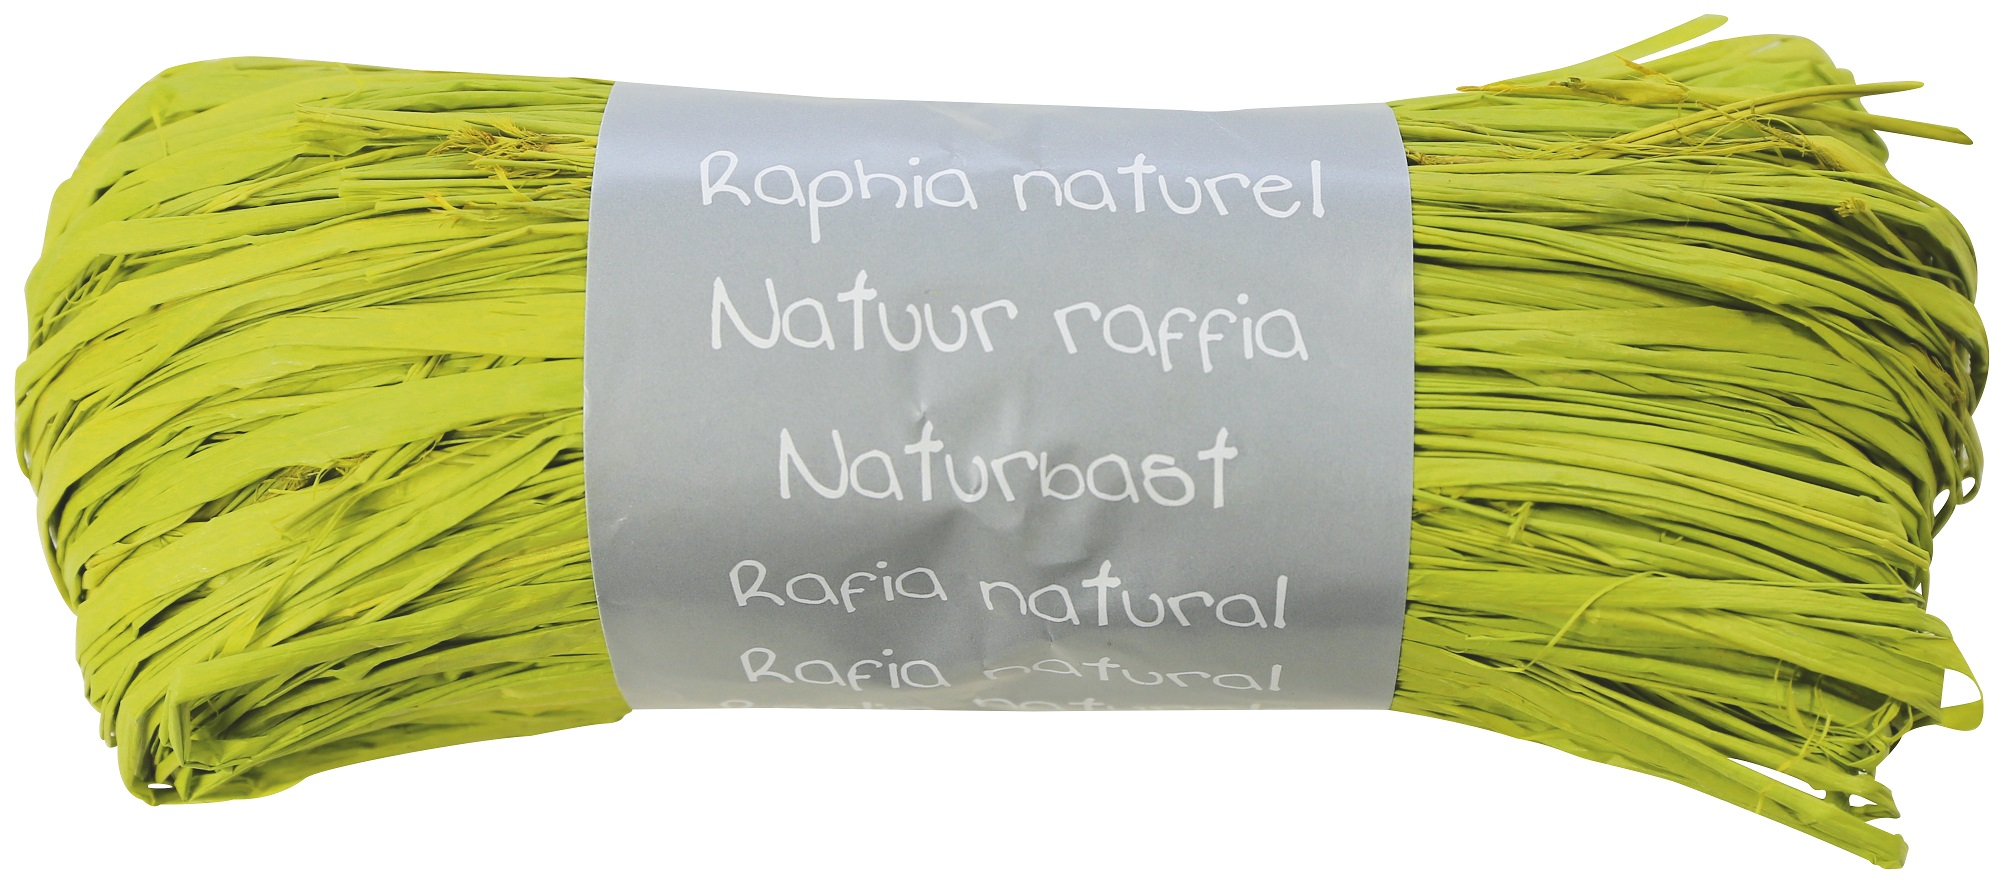 Pelote - Raphia naturel vert pomme